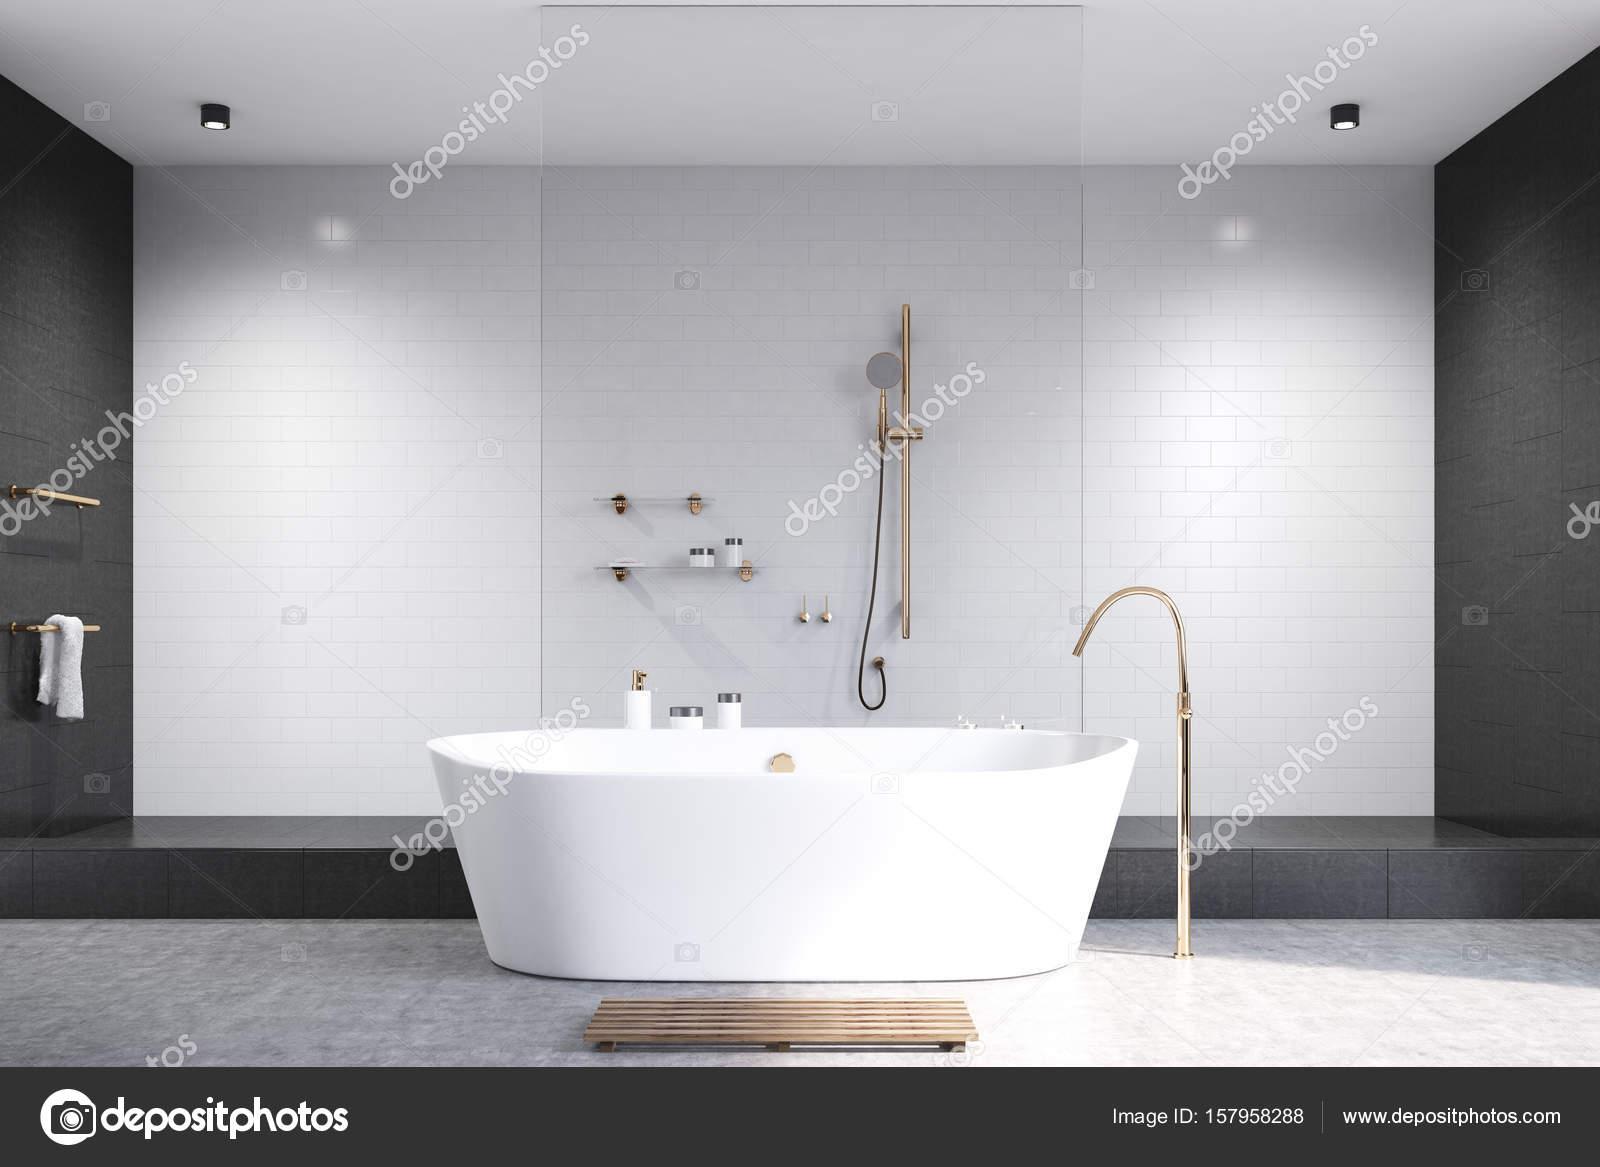 Zwarte Tegels Badkamer : Witte badkamer met zwarte tegels u stockfoto denisismagilov